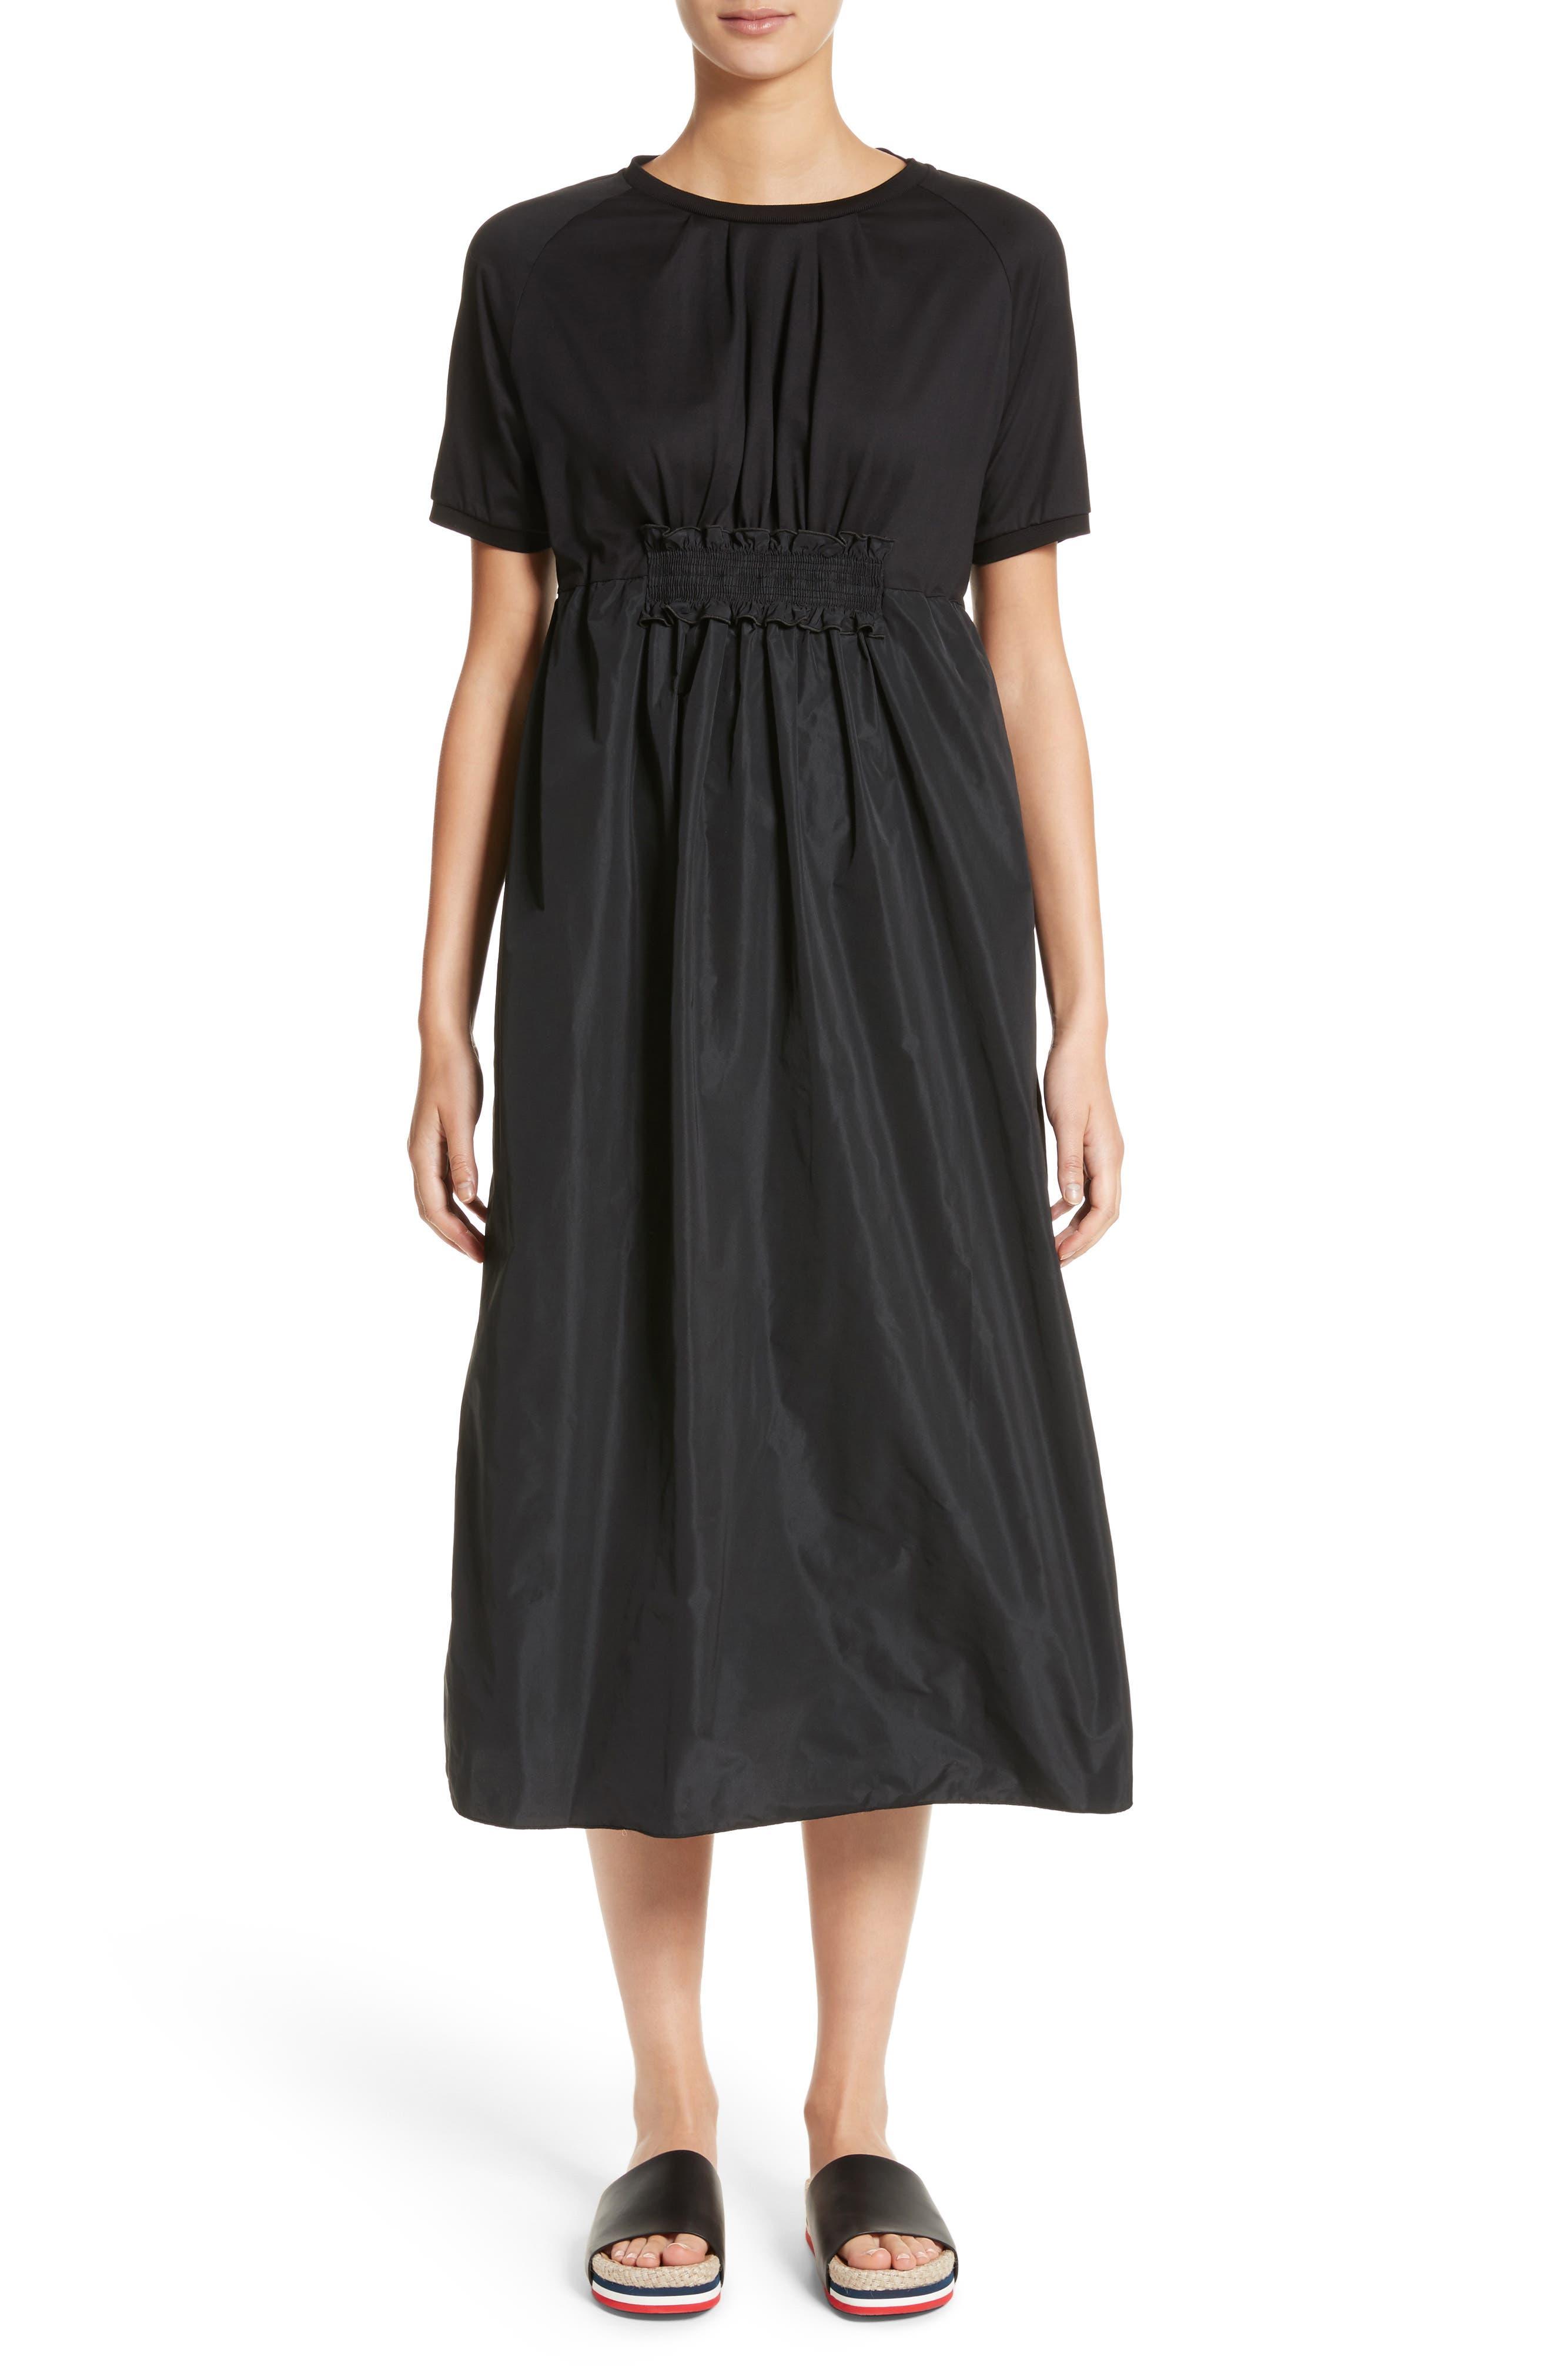 Alternate Image 1 Selected - Moncler Abito Shirred Midi Dress